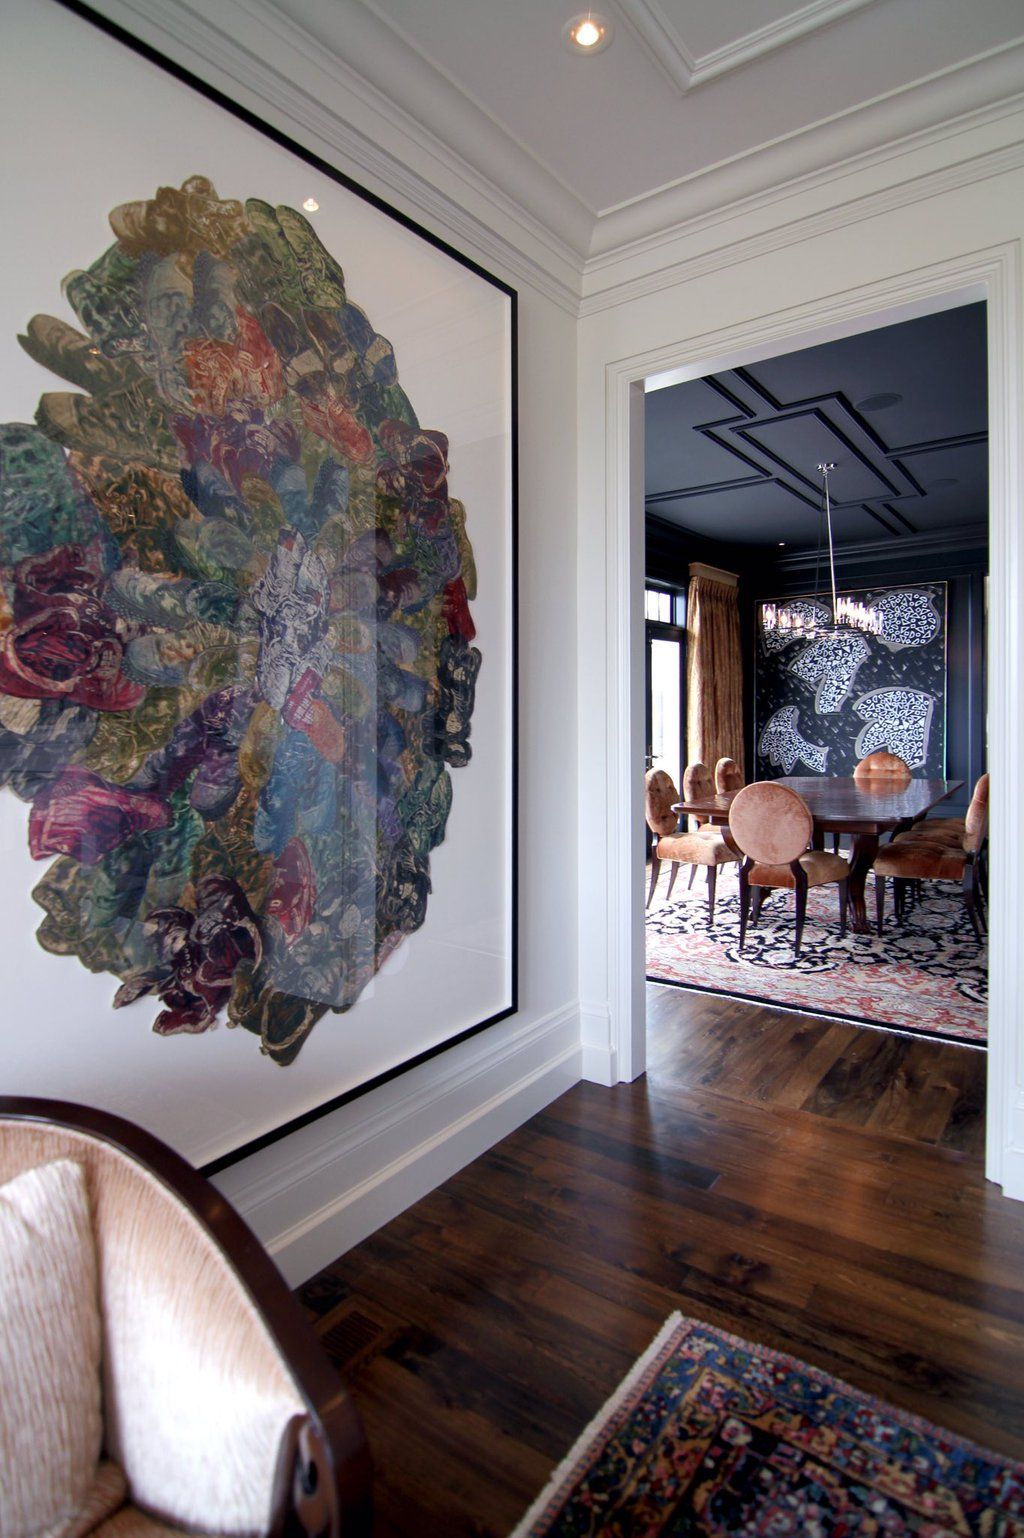 Tomas Pearce Idc Tomaspearceidc Twitter Interior Design